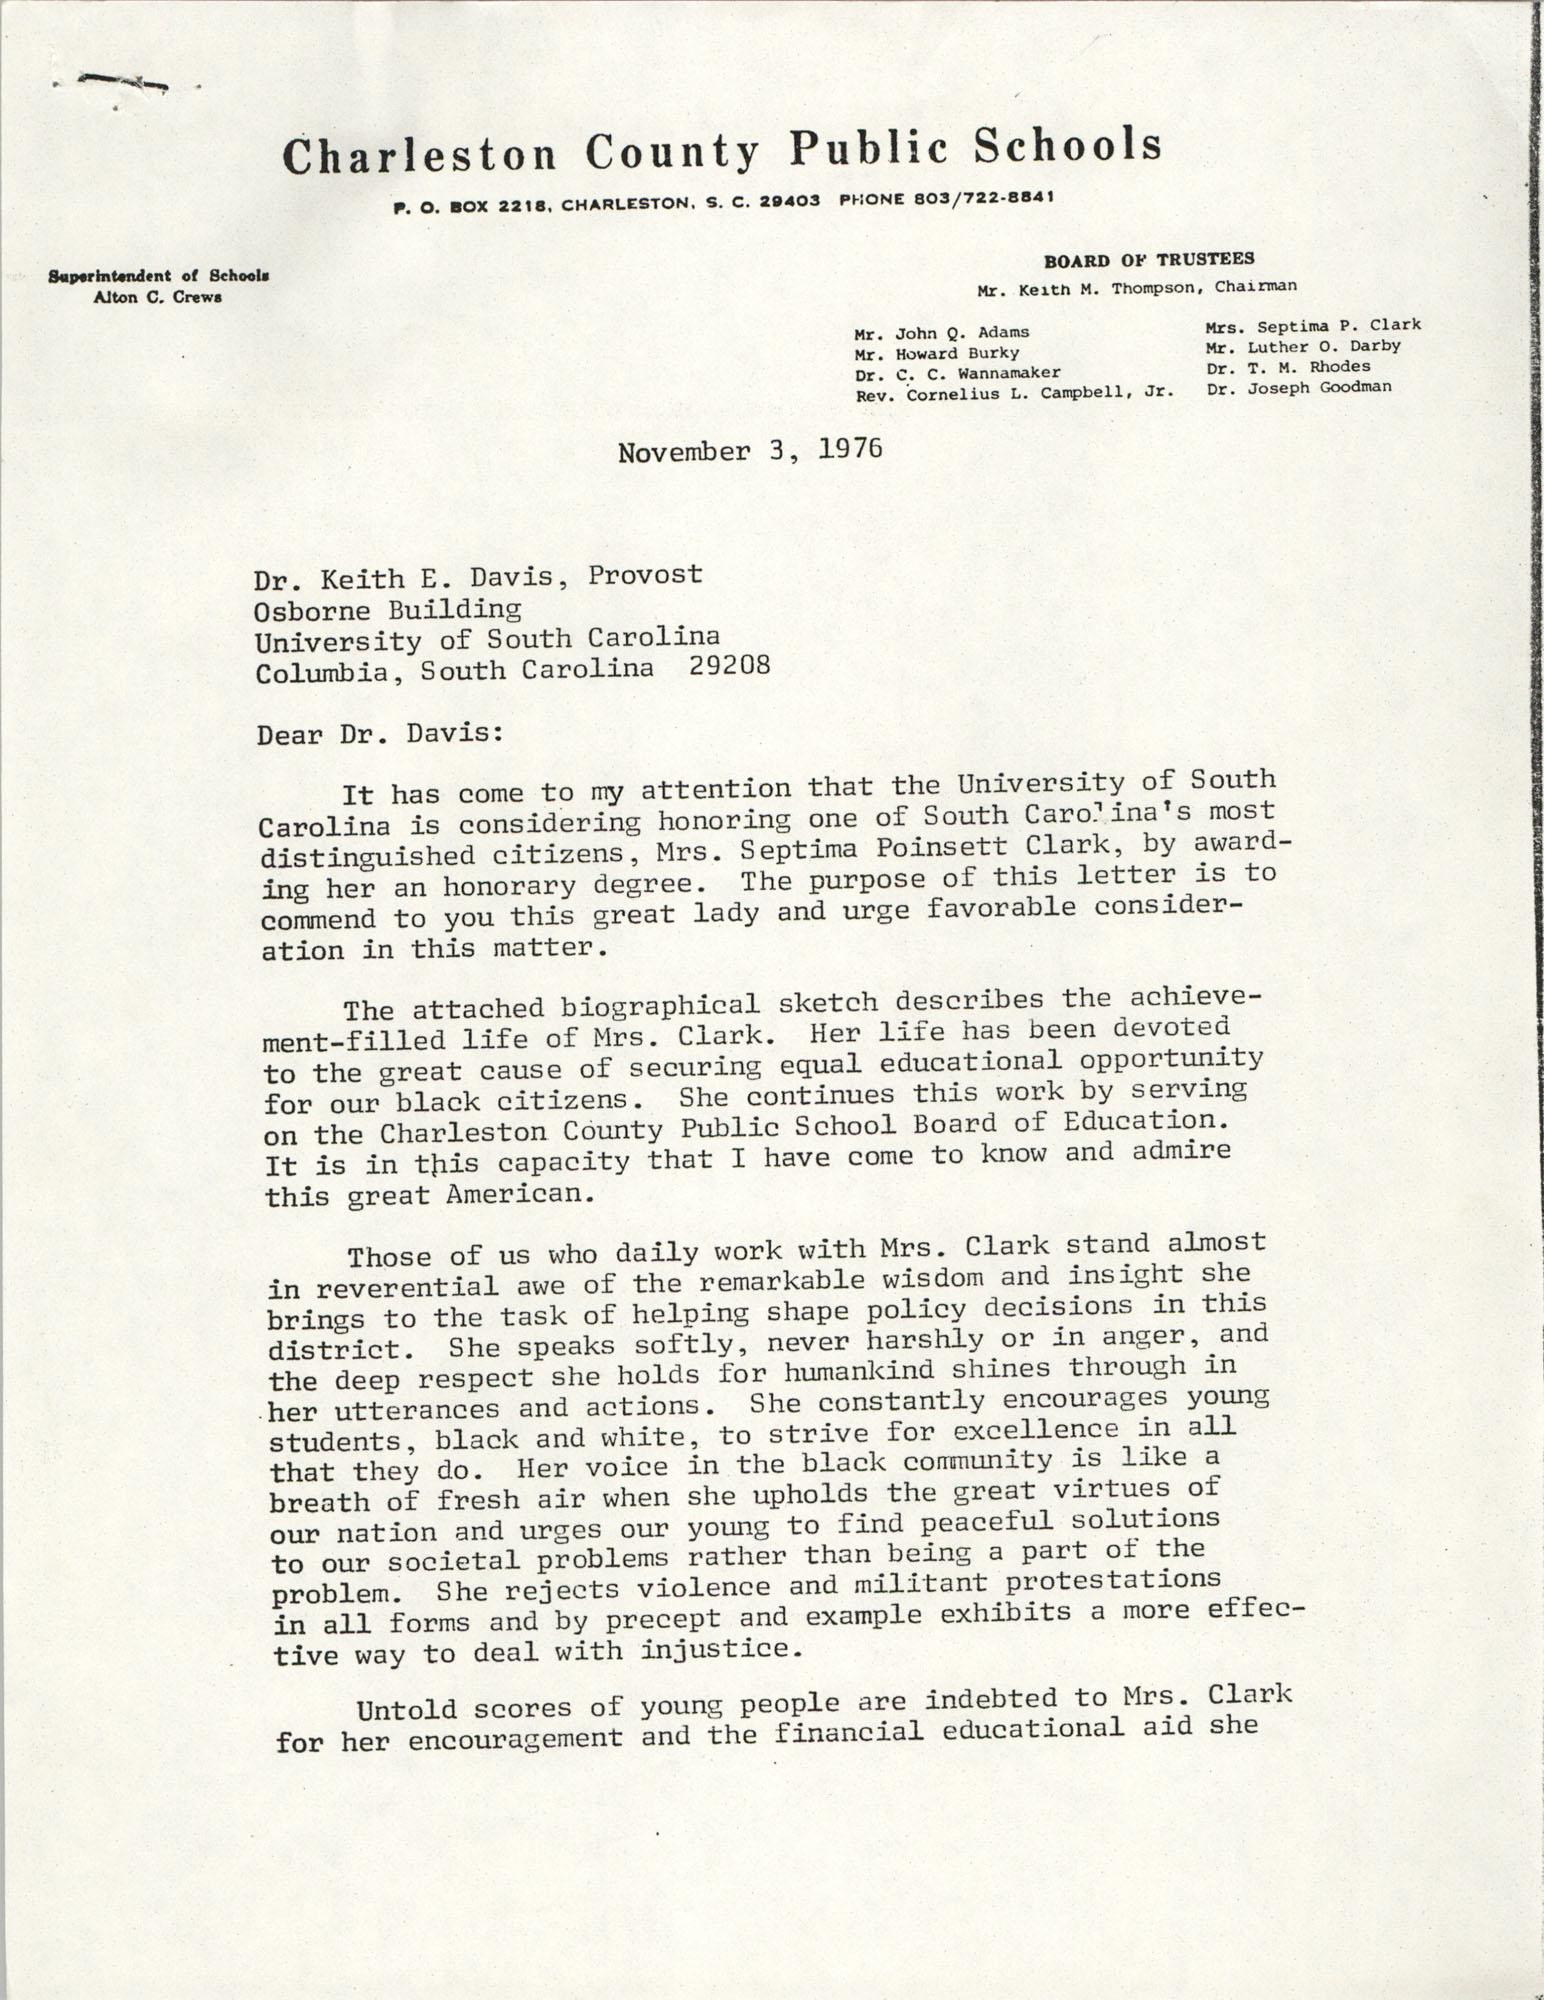 Letter from Alton C. Crews to Keith E. Davis, November 3, 1976